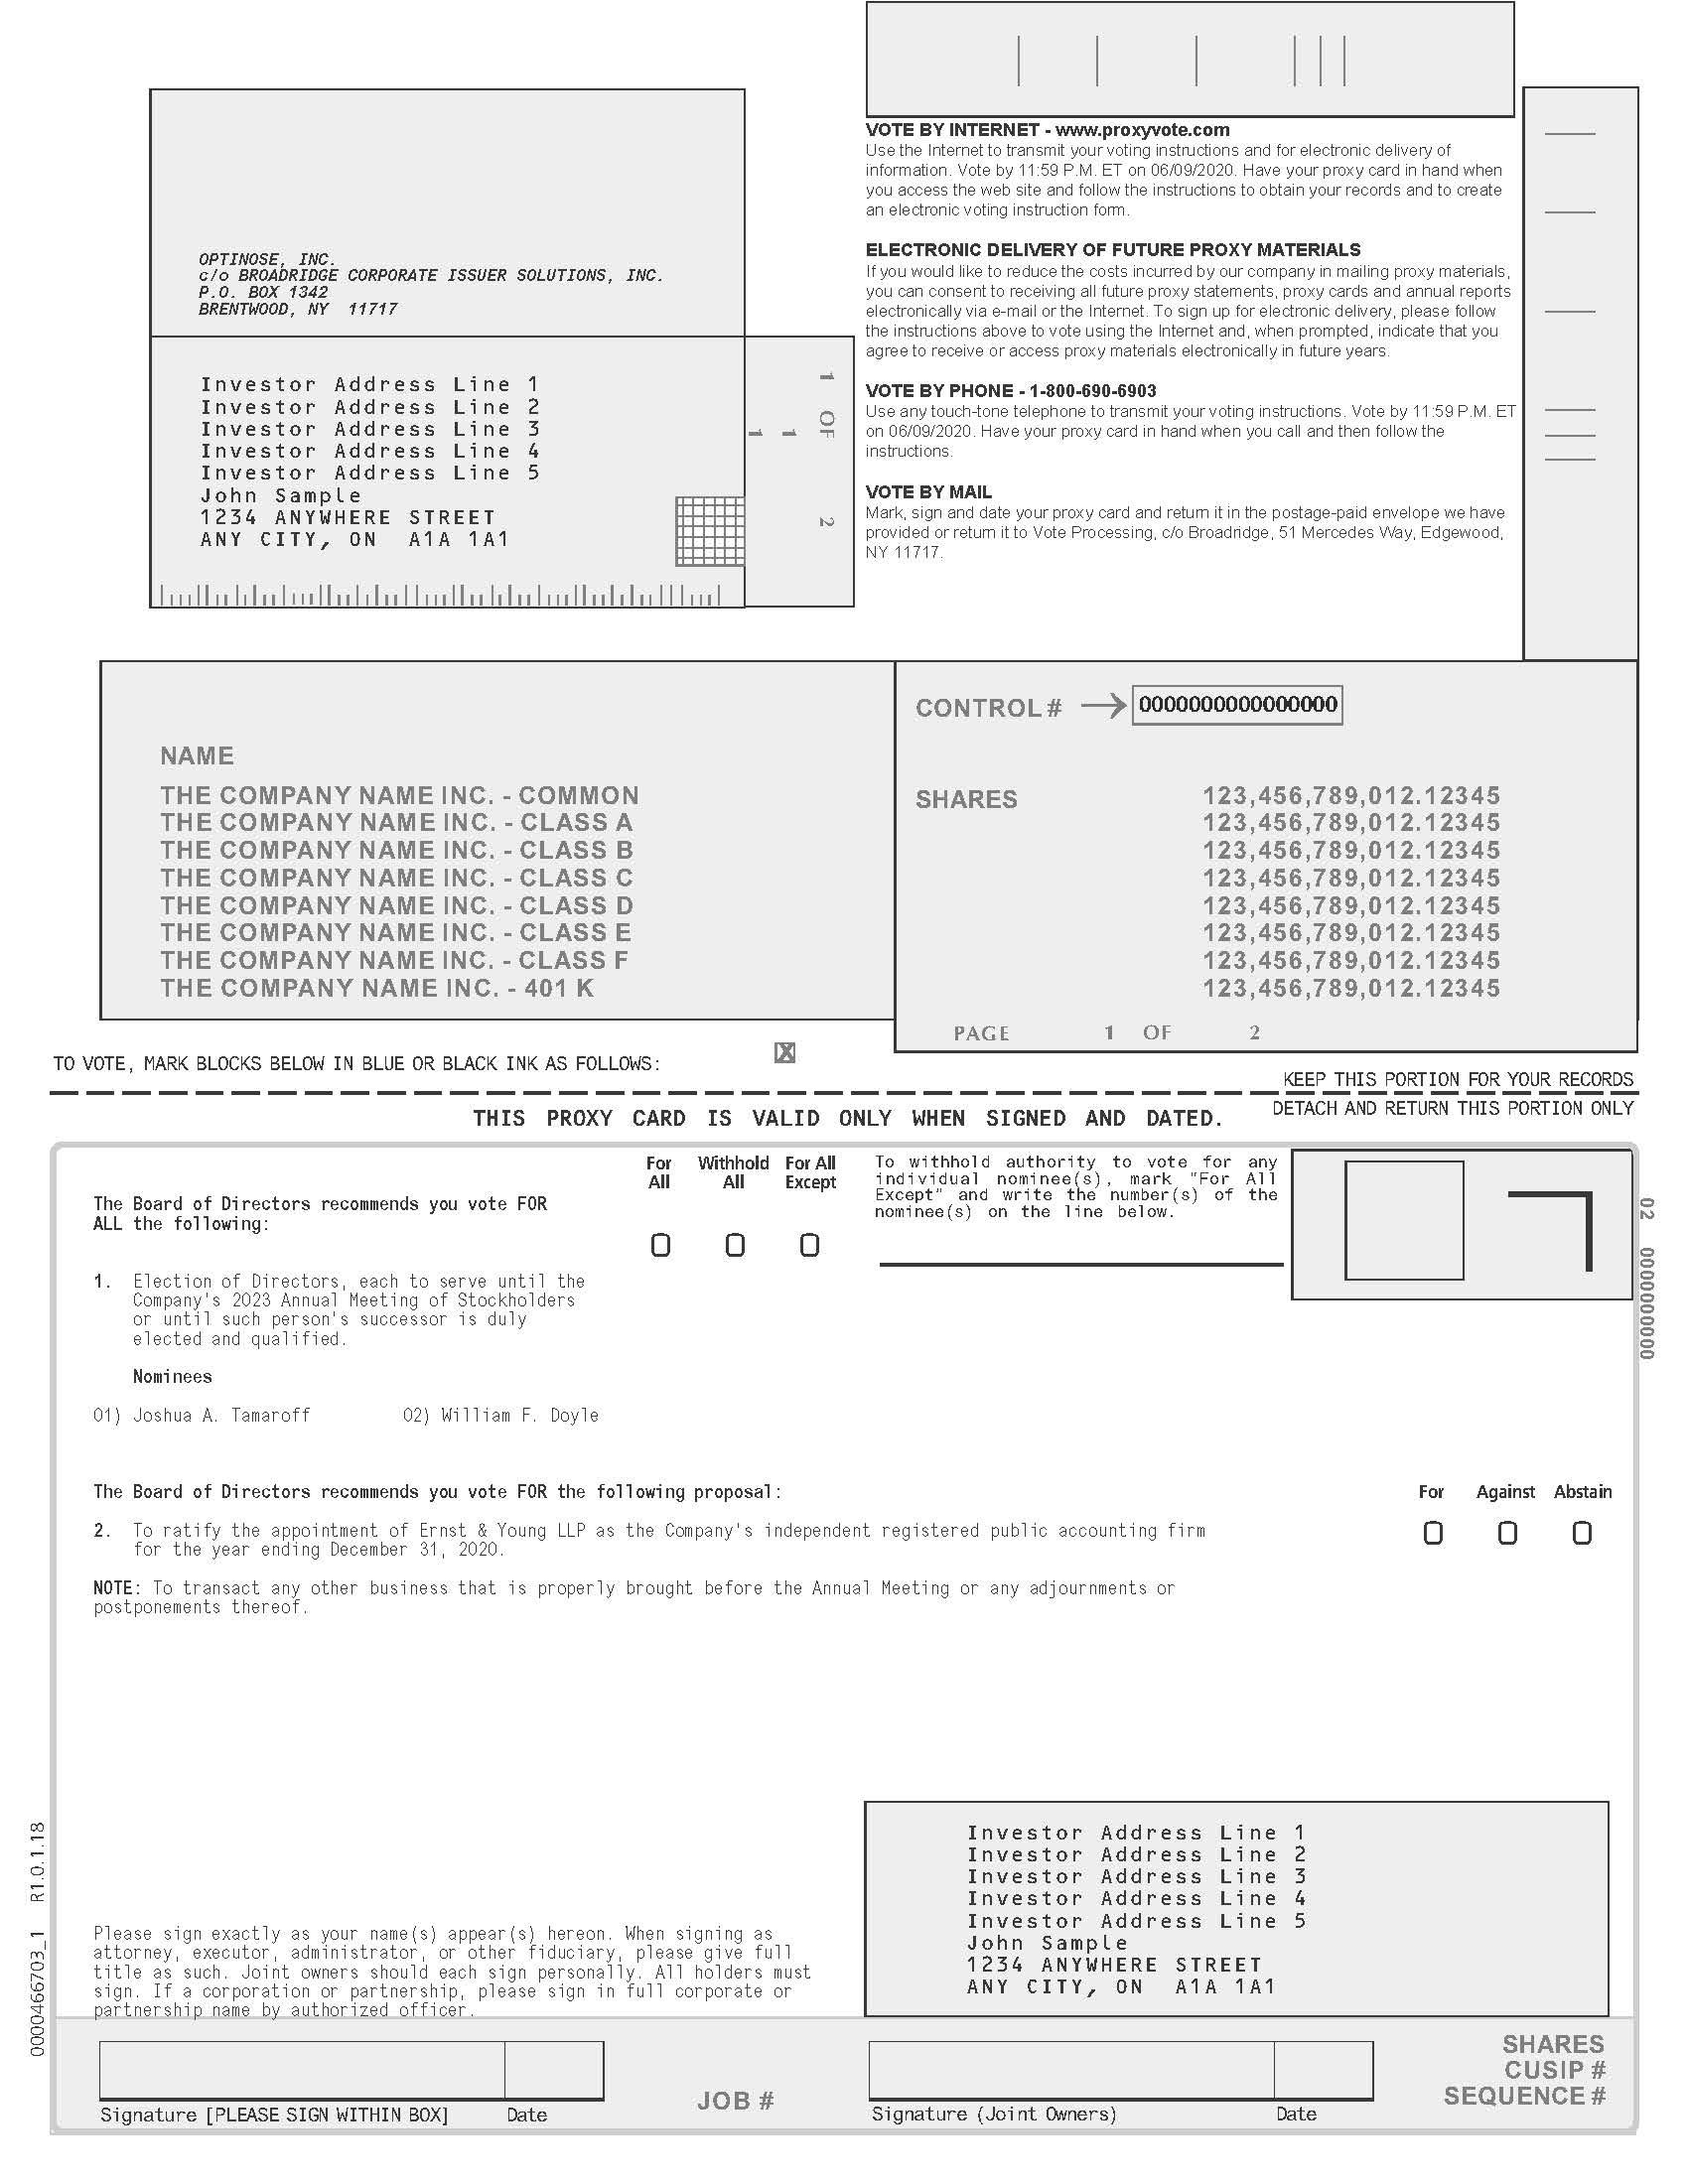 optinoseproxycarddraftnew_1.jpg